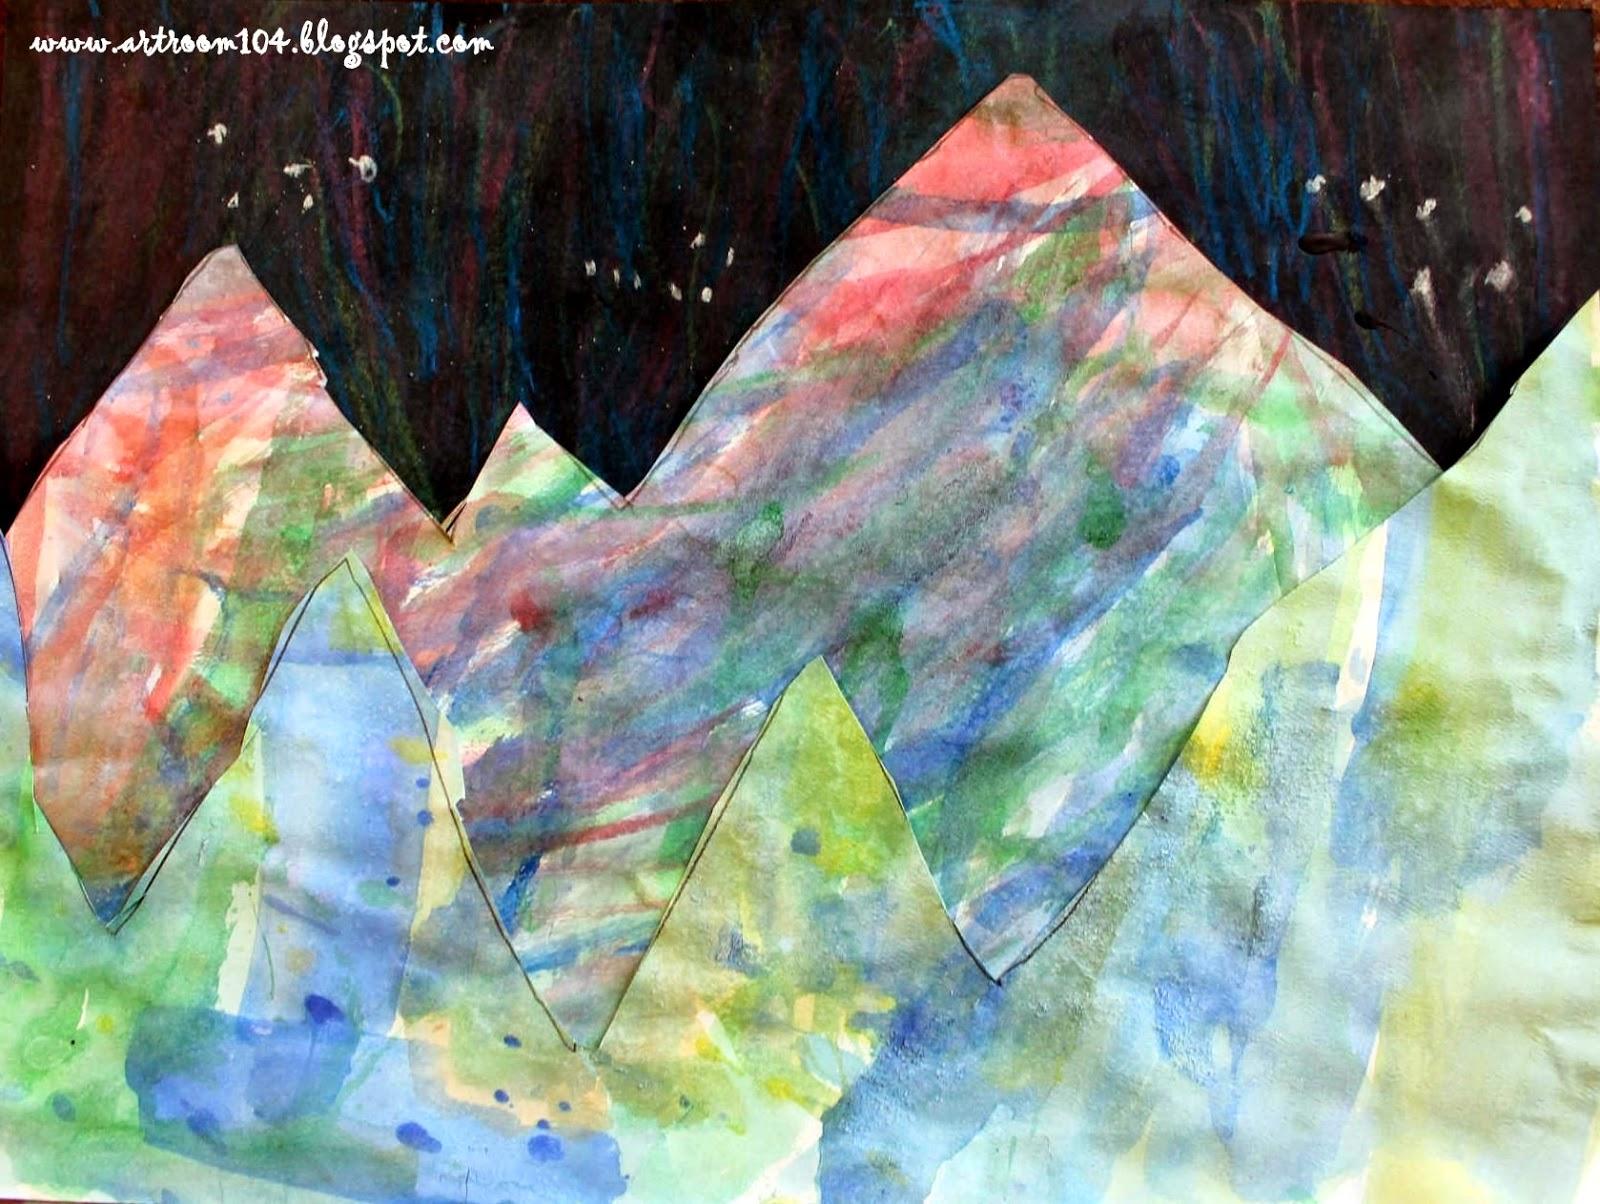 Art Room 104: May 2014